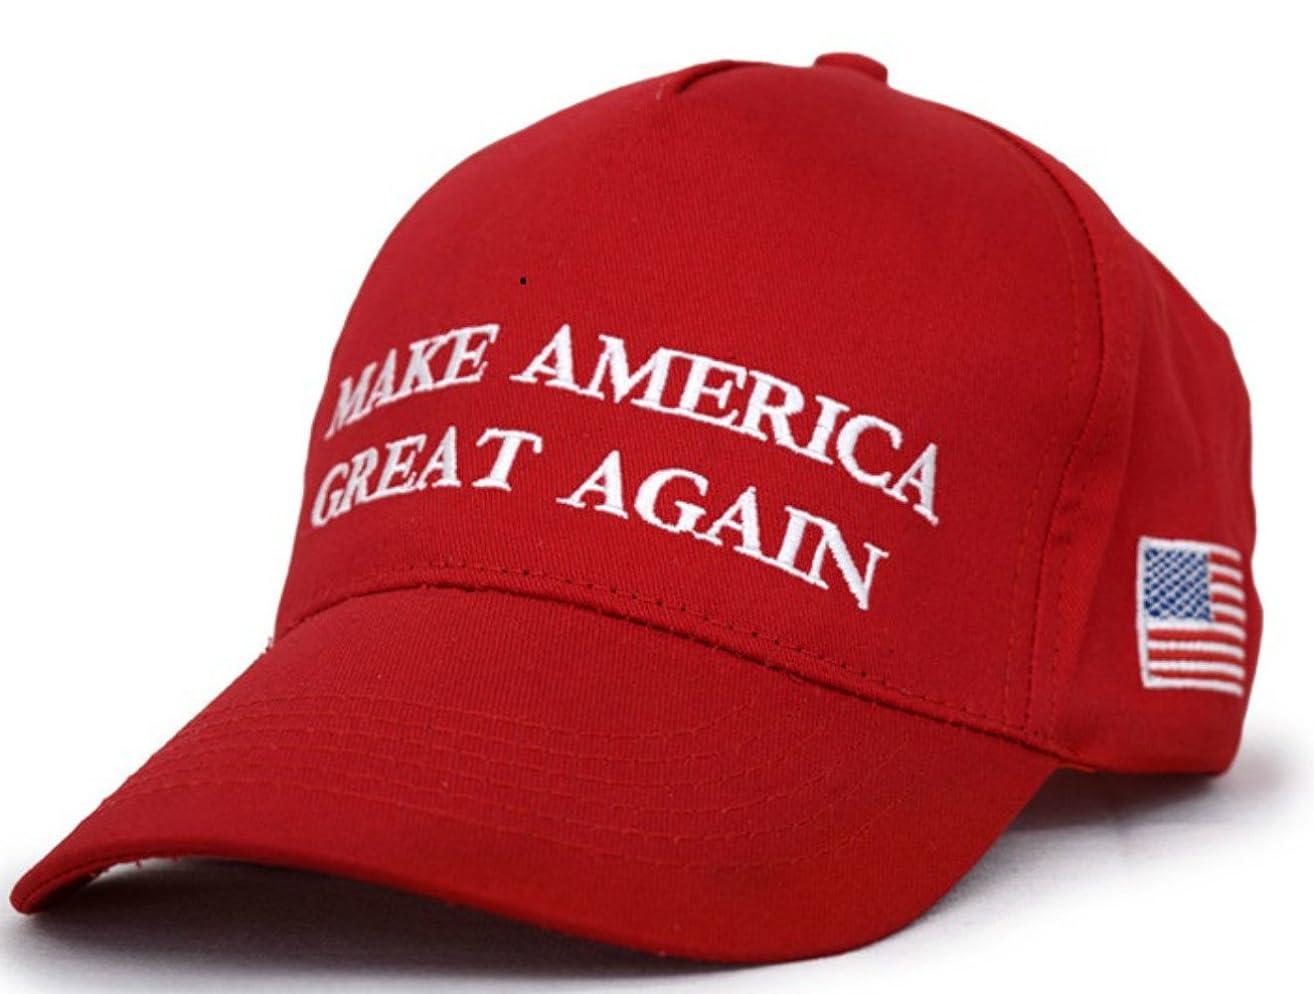 Besti Make America Great Again Donald Trump Slogan with USA Flag Cap Adjustable Baseball Hat Red